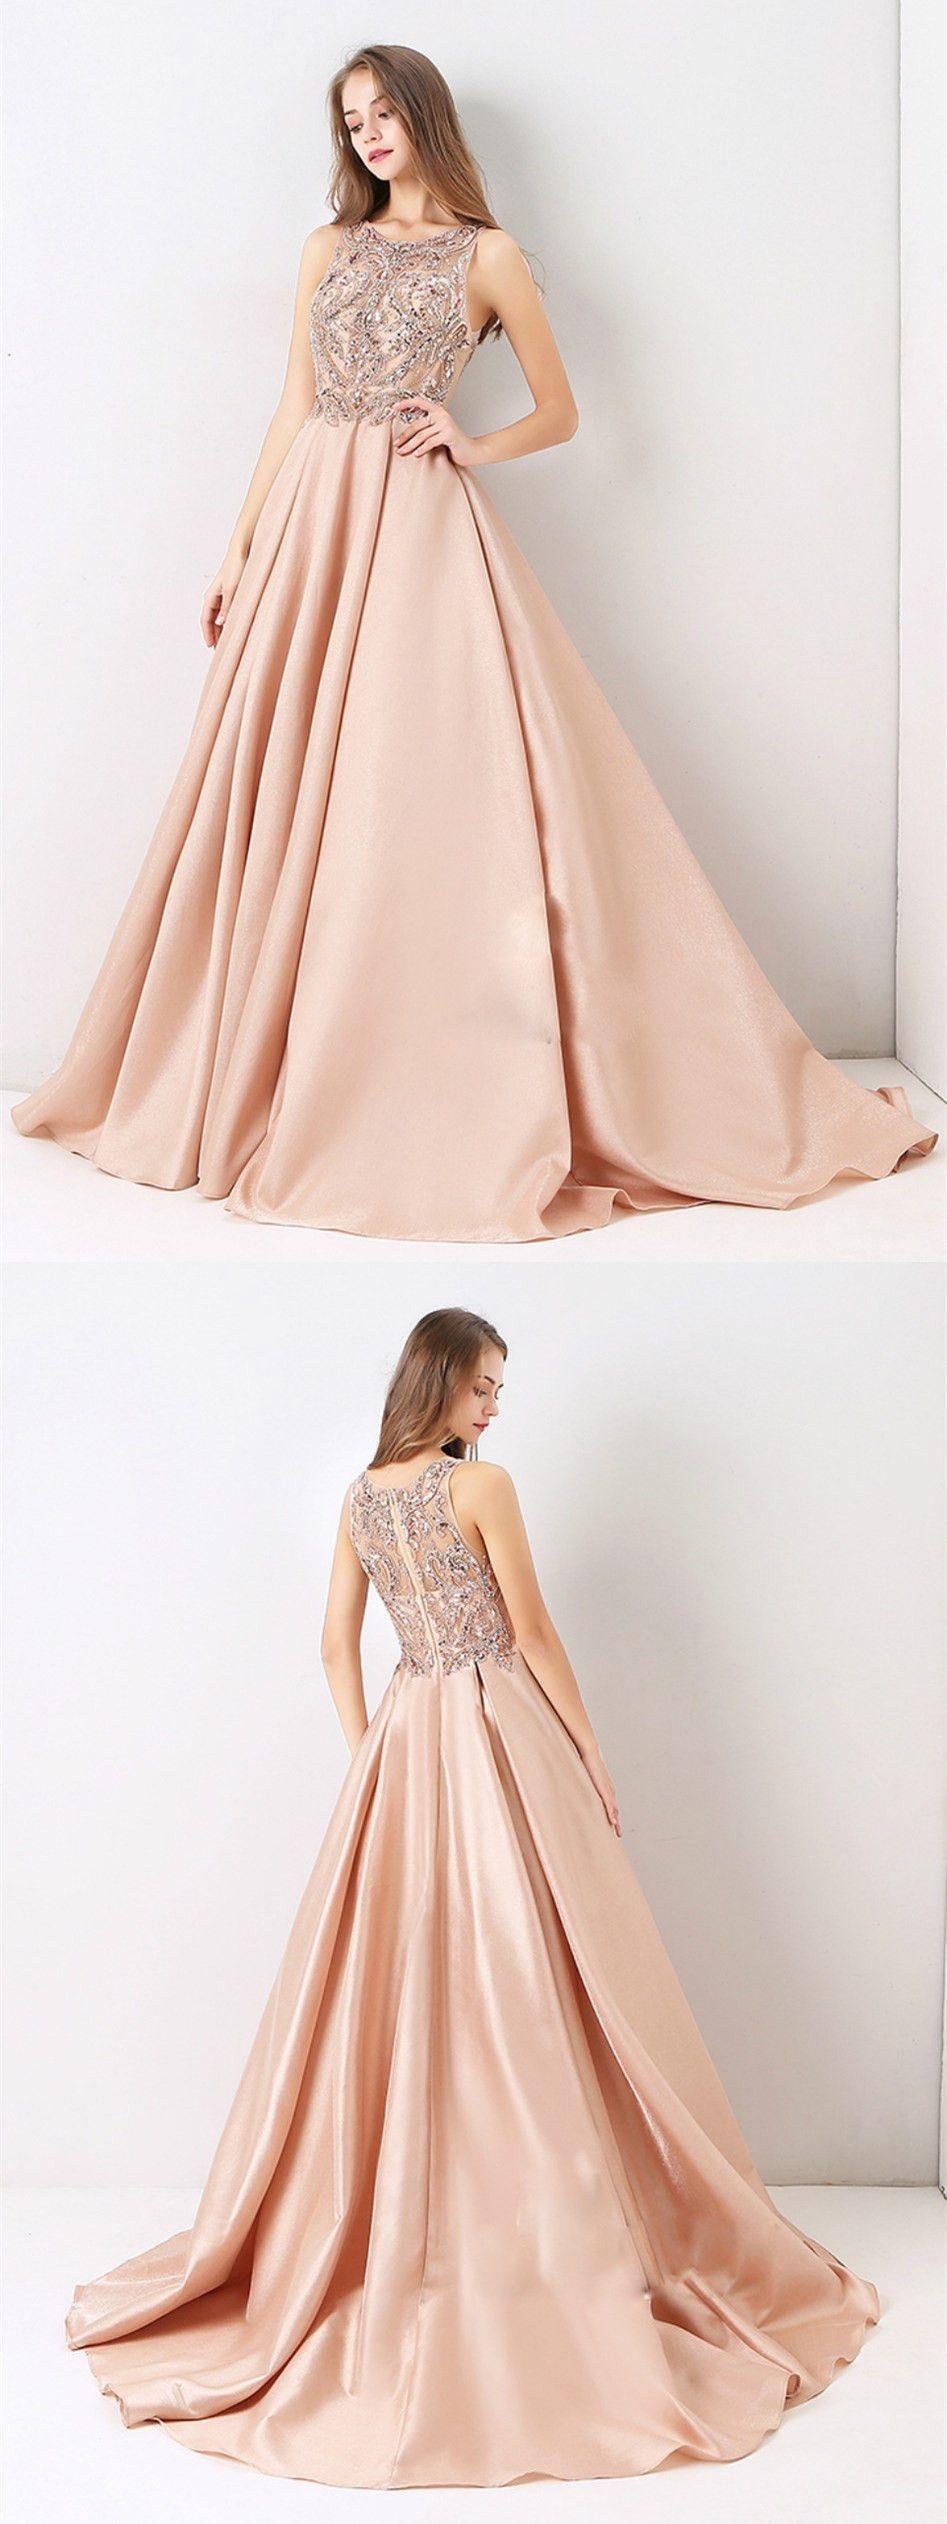 Aline princess scoop neck sleeveless floor length prom dresses